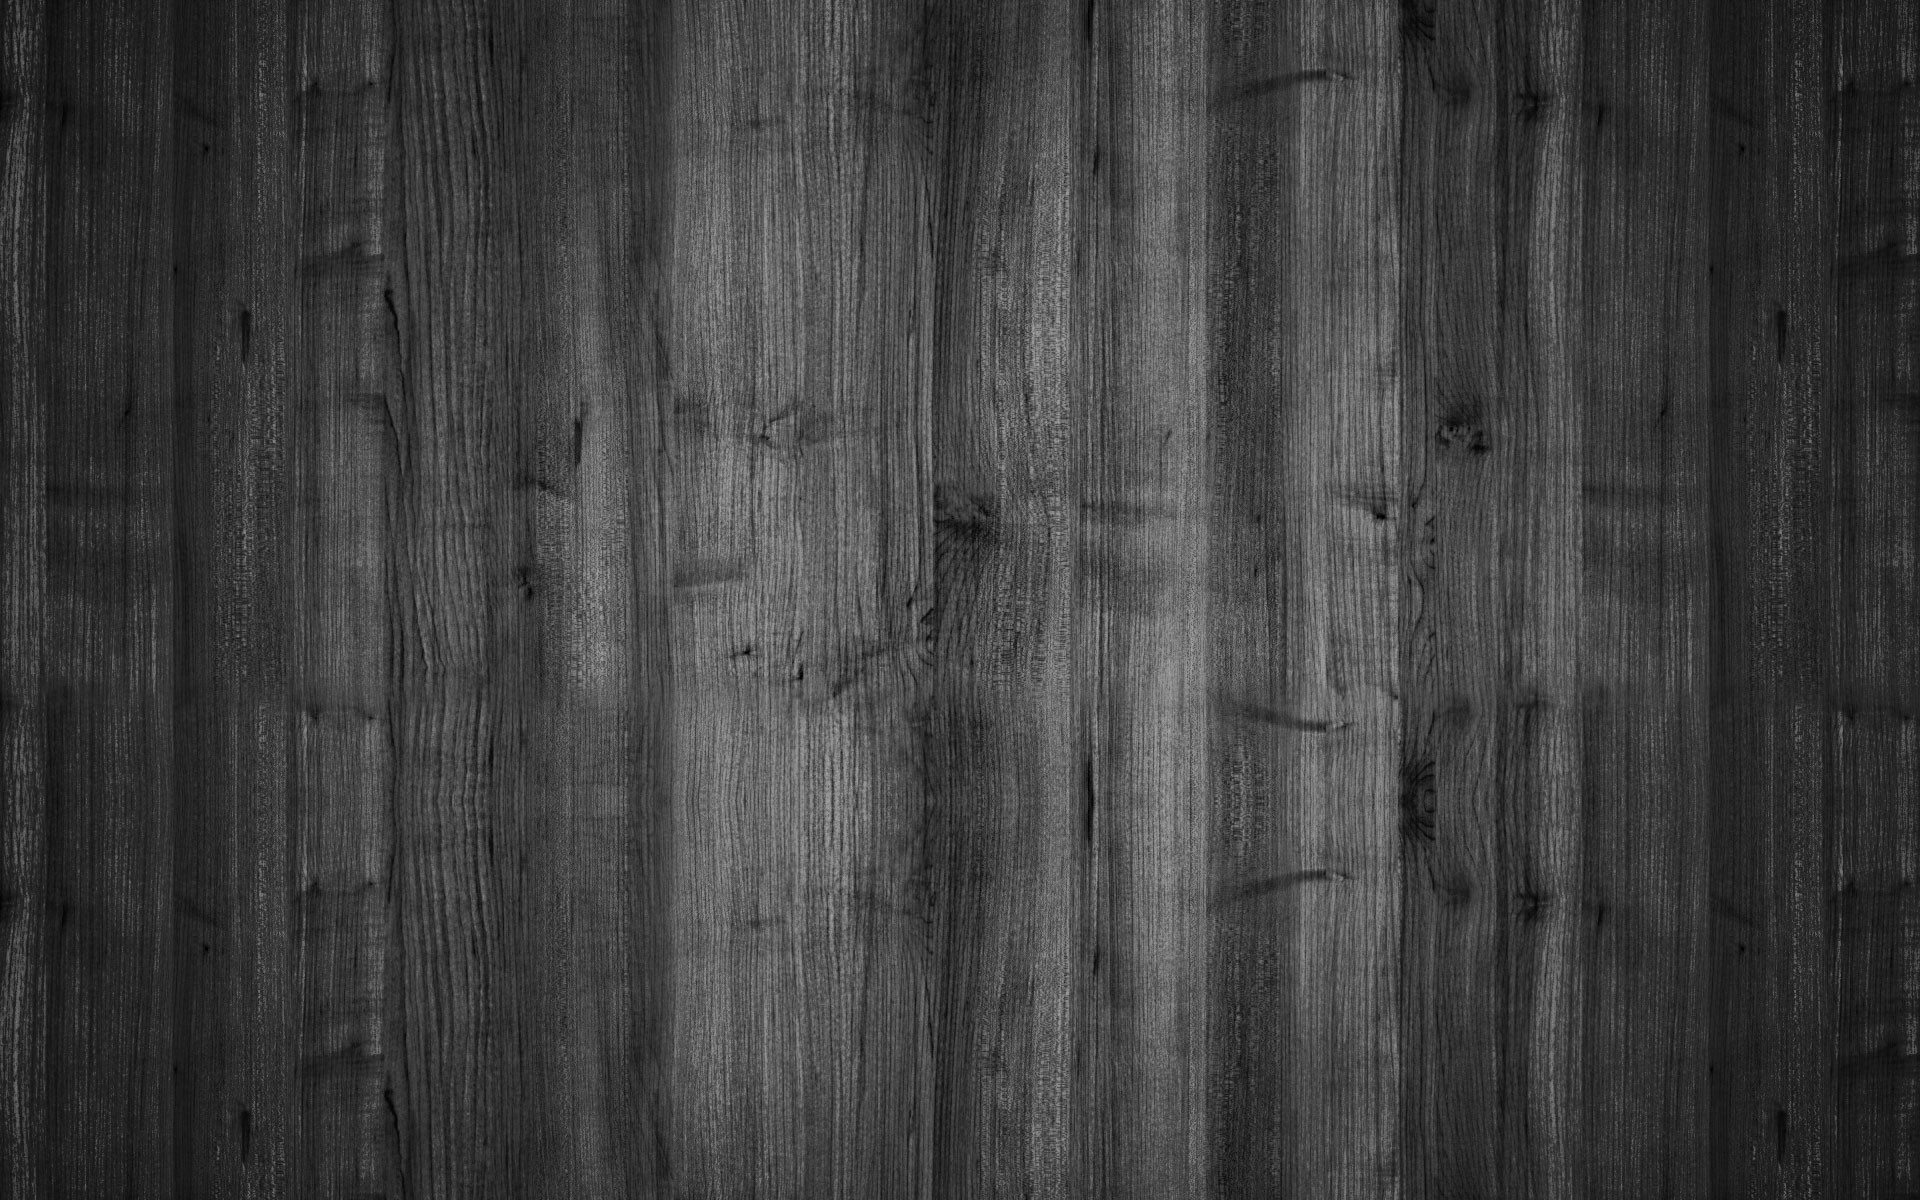 Rustic Barn Wood Background 183 '� Download Free Beautiful